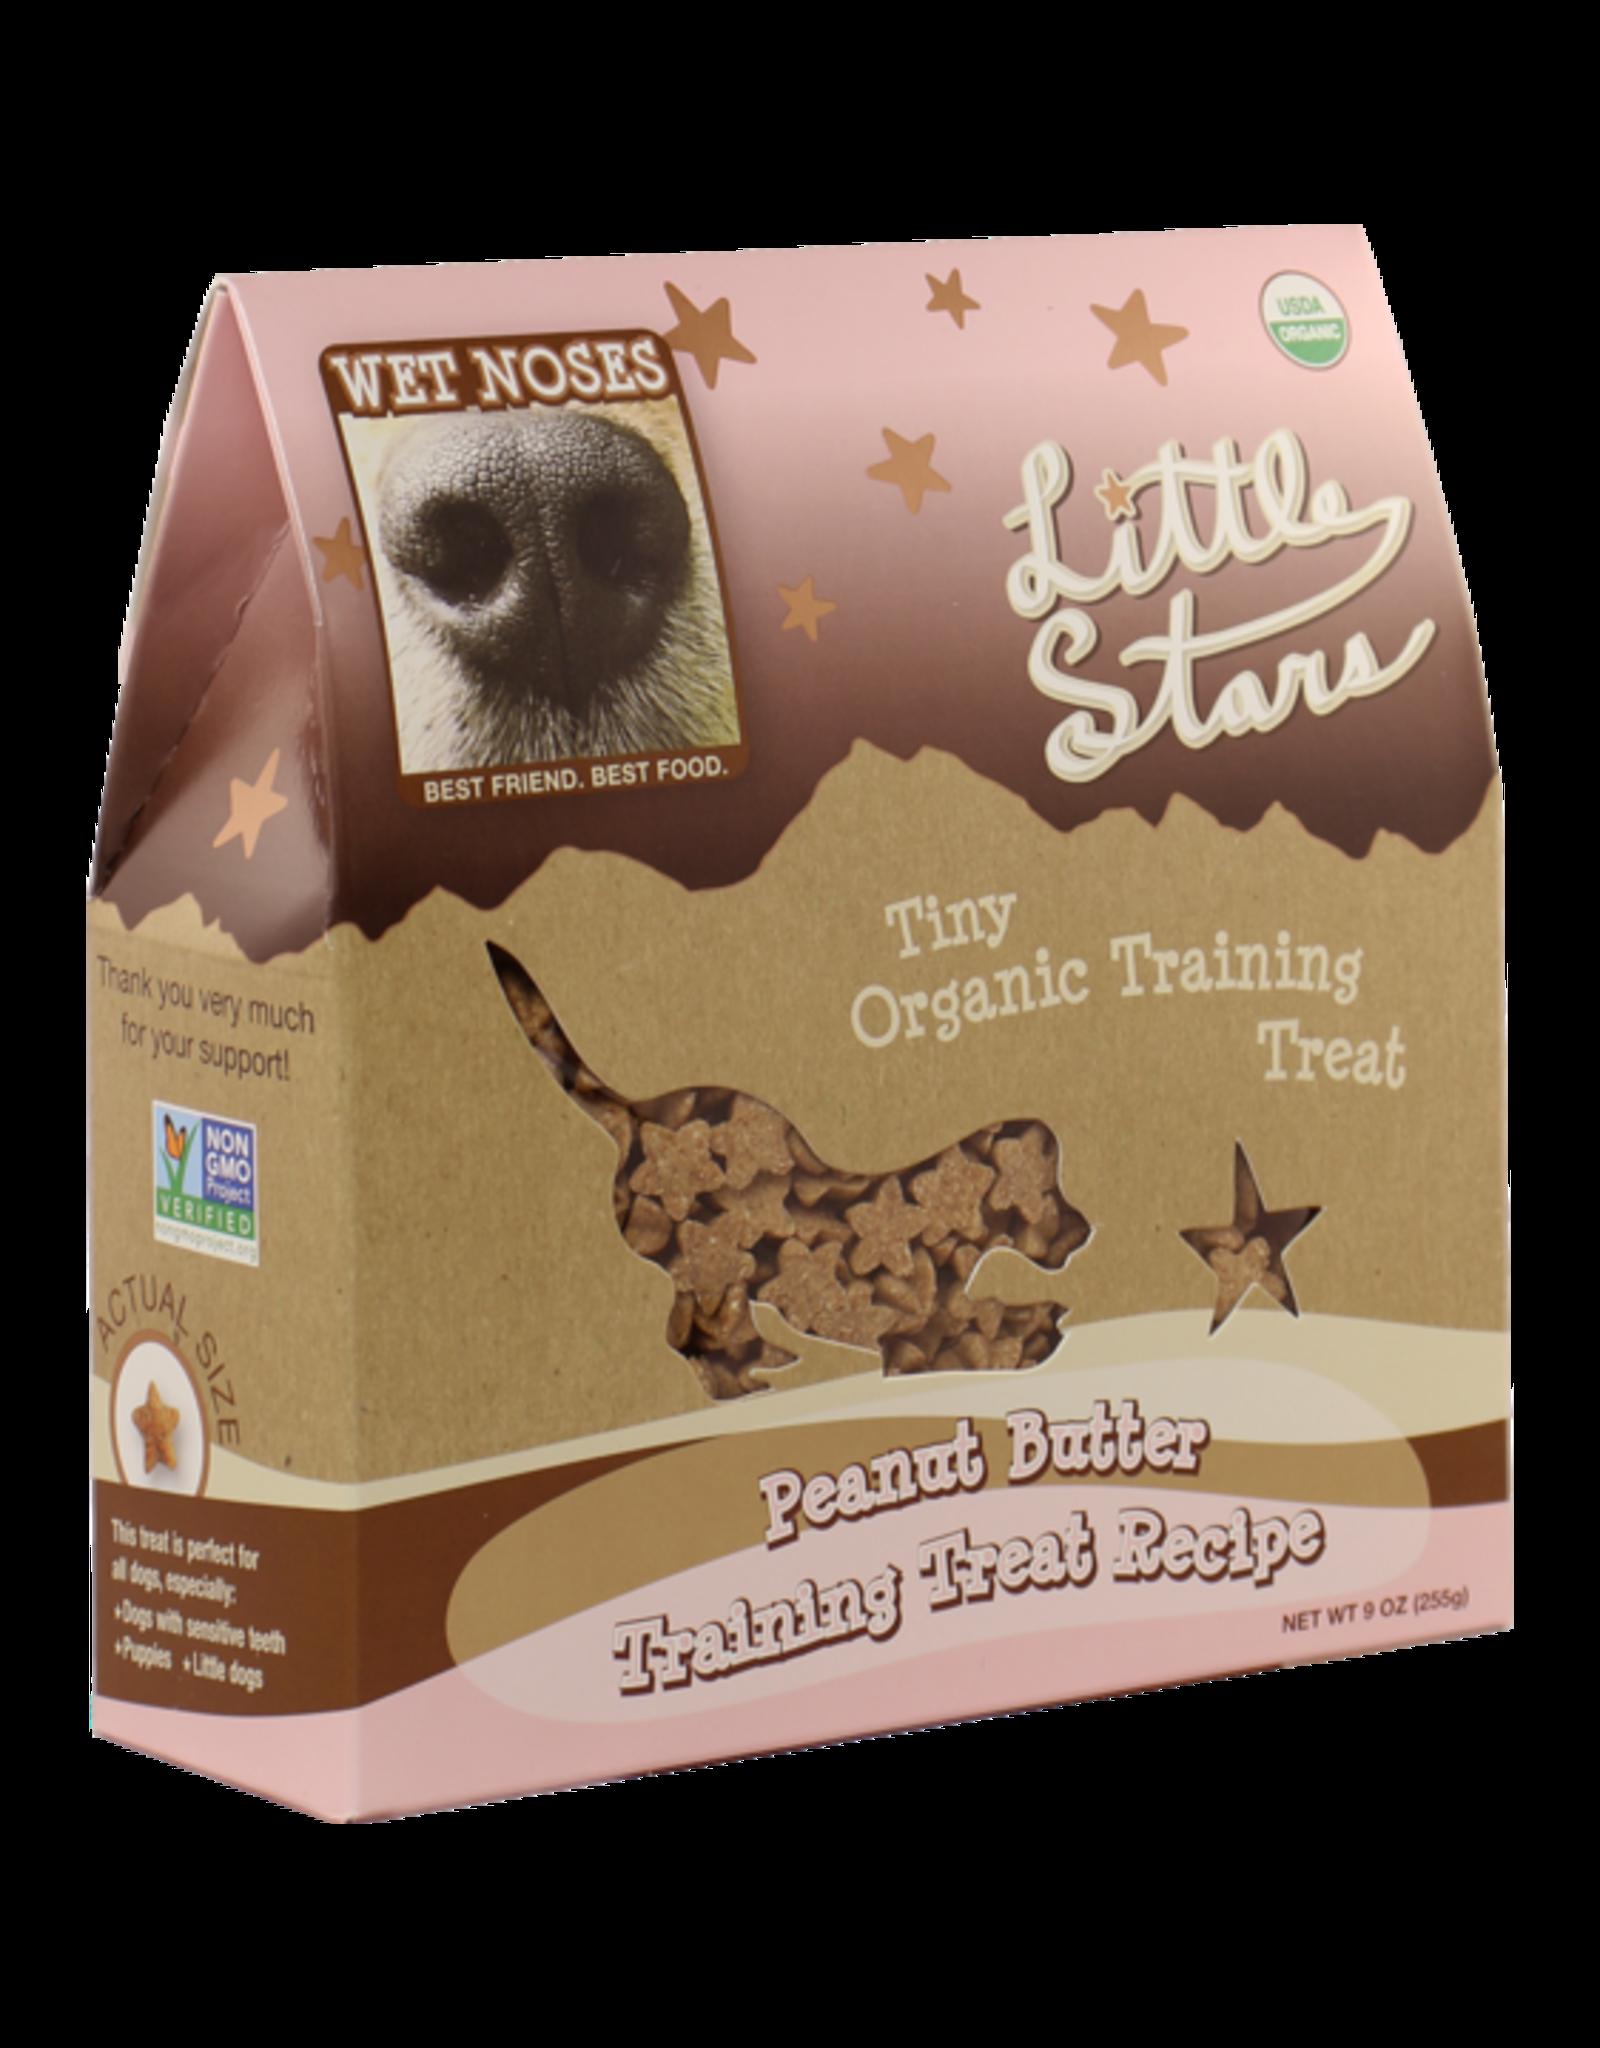 Wet Noses Wet Noses Little Stars Peanut Butter Dog Training Treat 9oz